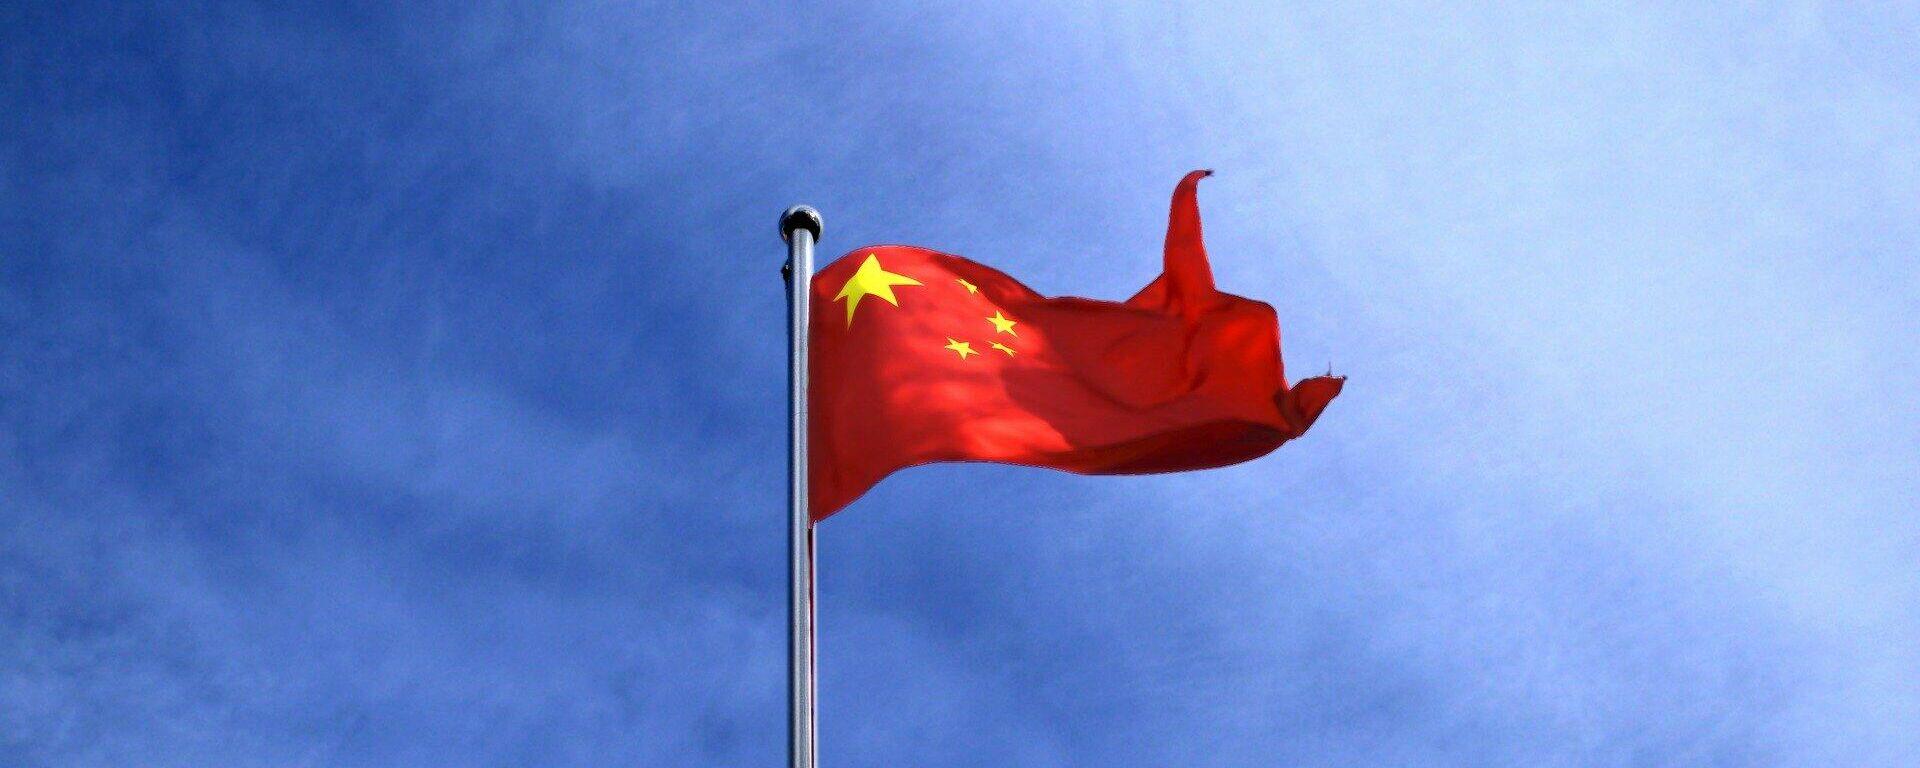 Chinas Flagge (Symbolbild) - SNA, 1920, 30.09.2021